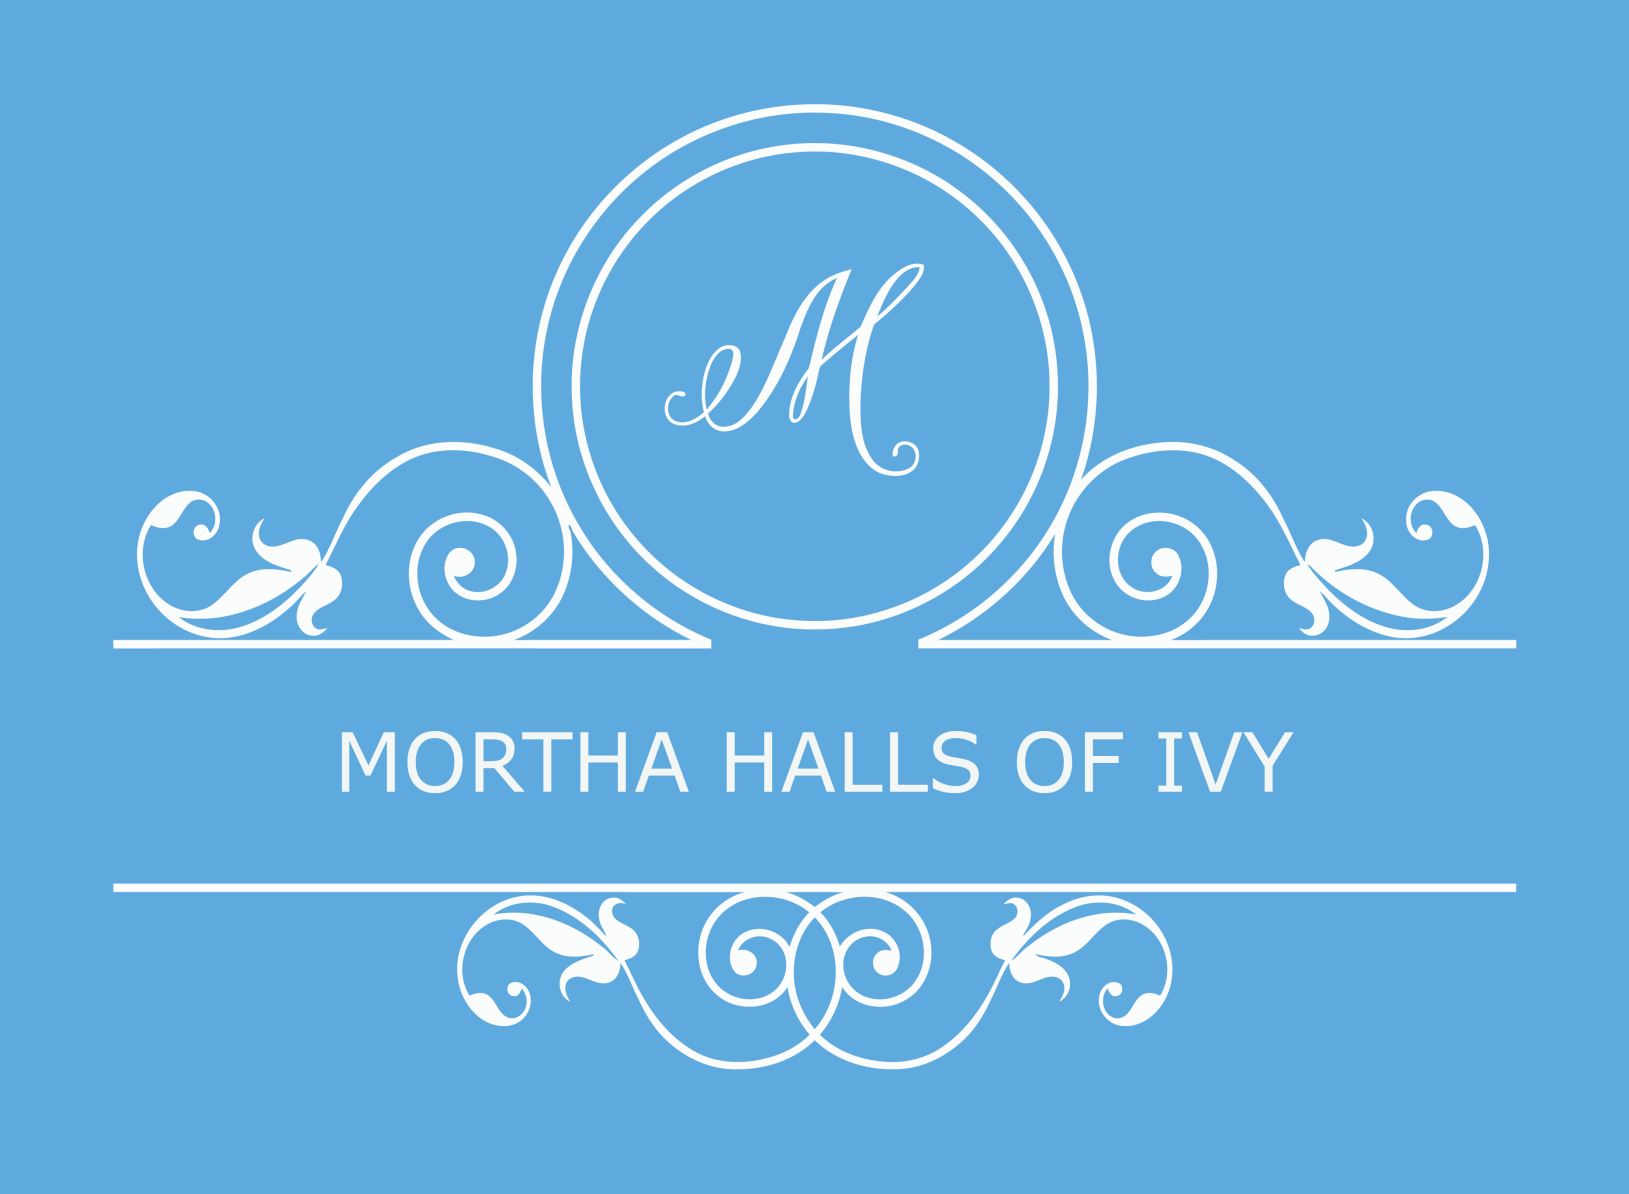 Mortha Halls of Ivy